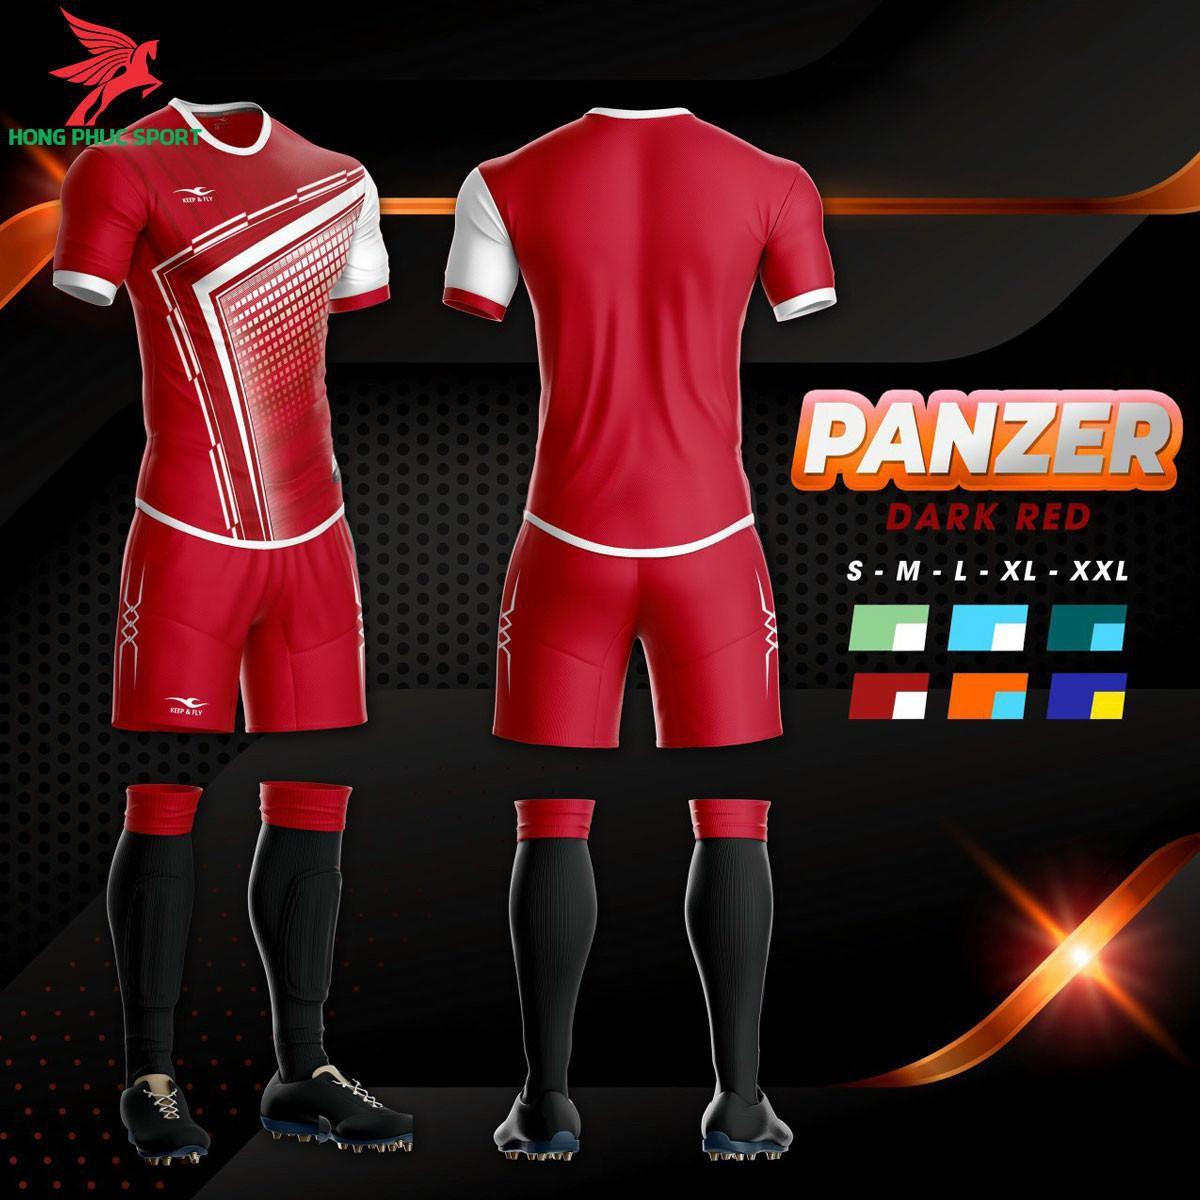 https://cdn.hongphucsport.com/unsafe/s4.shopbay.vn/files/285/ao-khong-logo-keep-fly-panzer-2021-mau-do-603ef6113be87.jpg